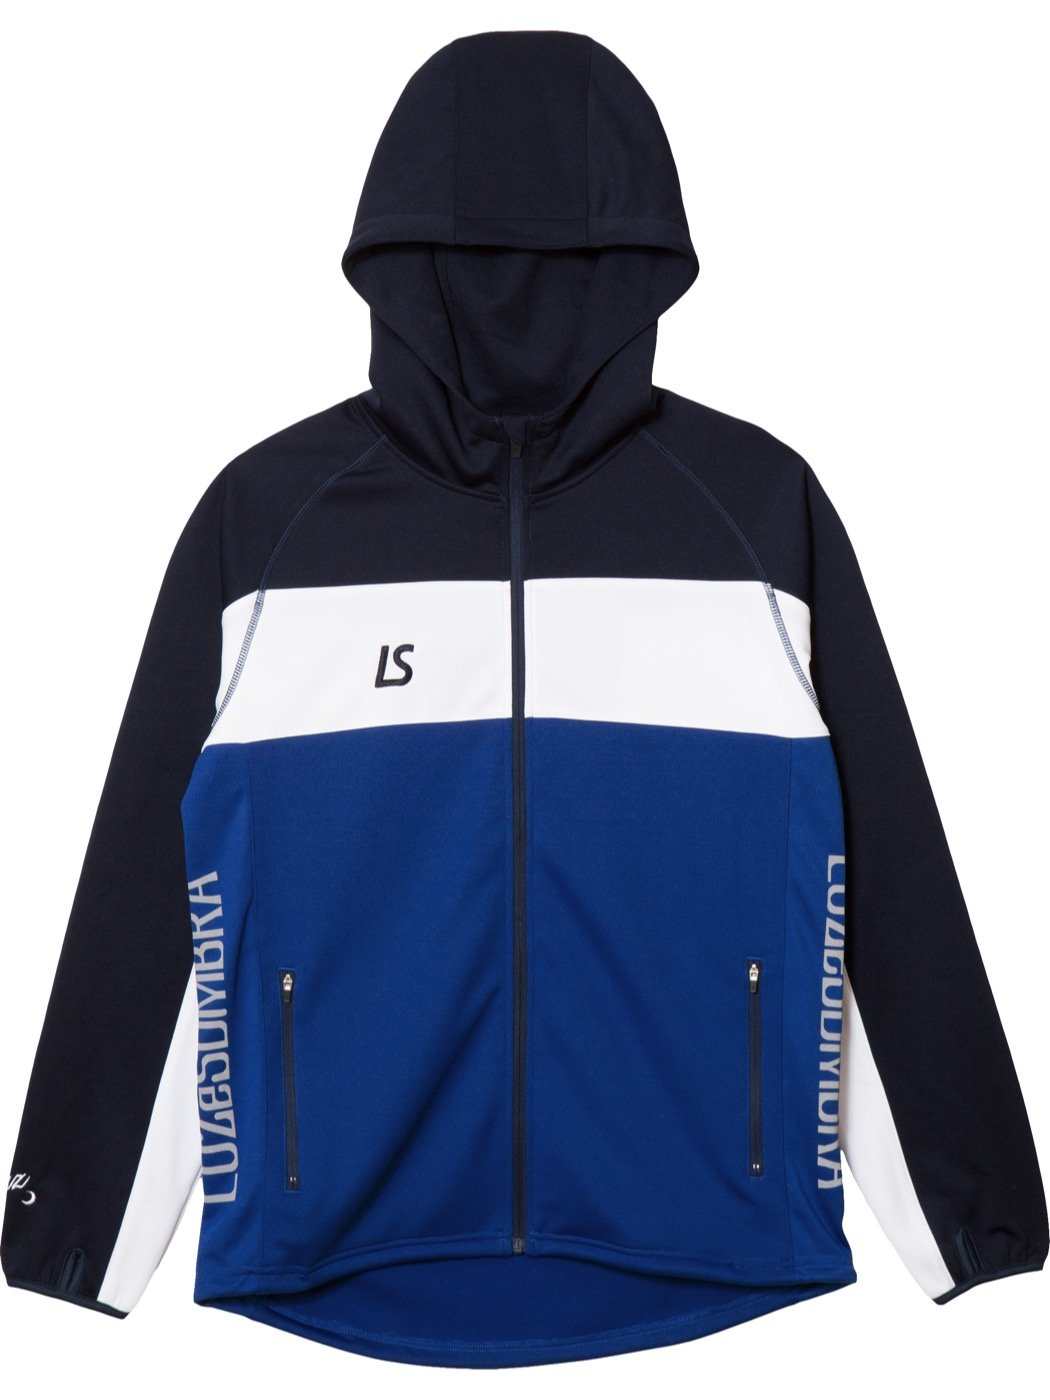 LUZeSOMBRA(ルースイソンブラ) STREAM LINE TRAINING ジャージトップボトムセット F1811600 B07C691QDD Large ブルー/ネイビー ブルー/ネイビー Large